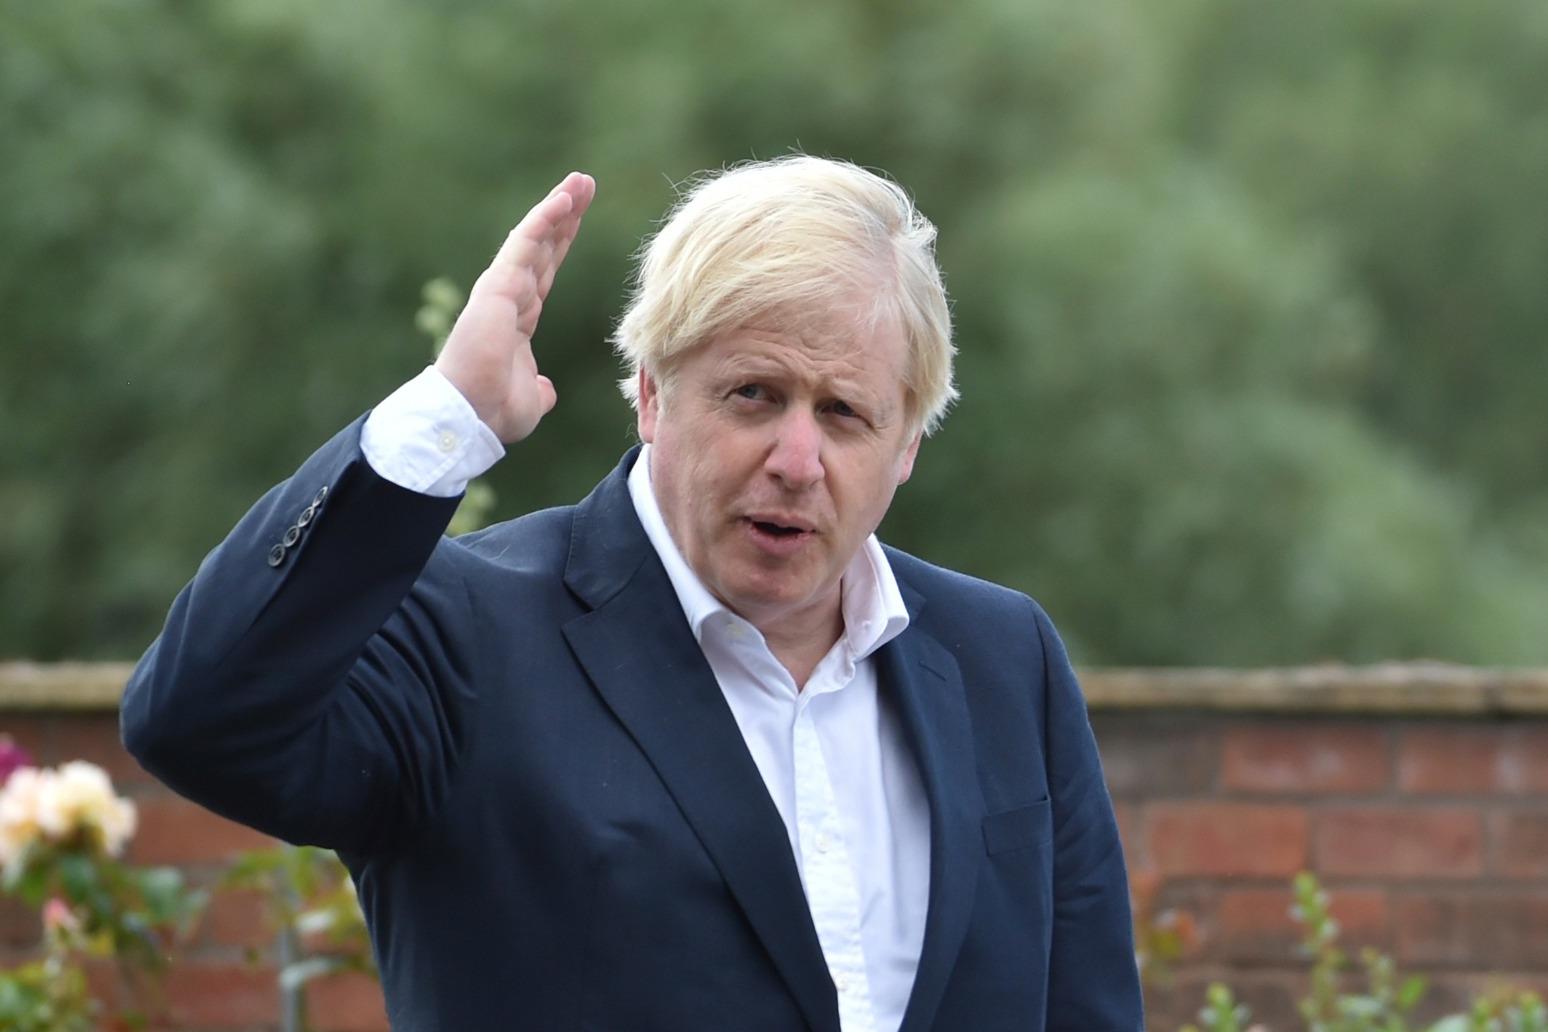 Johnson issues further quarantine warning